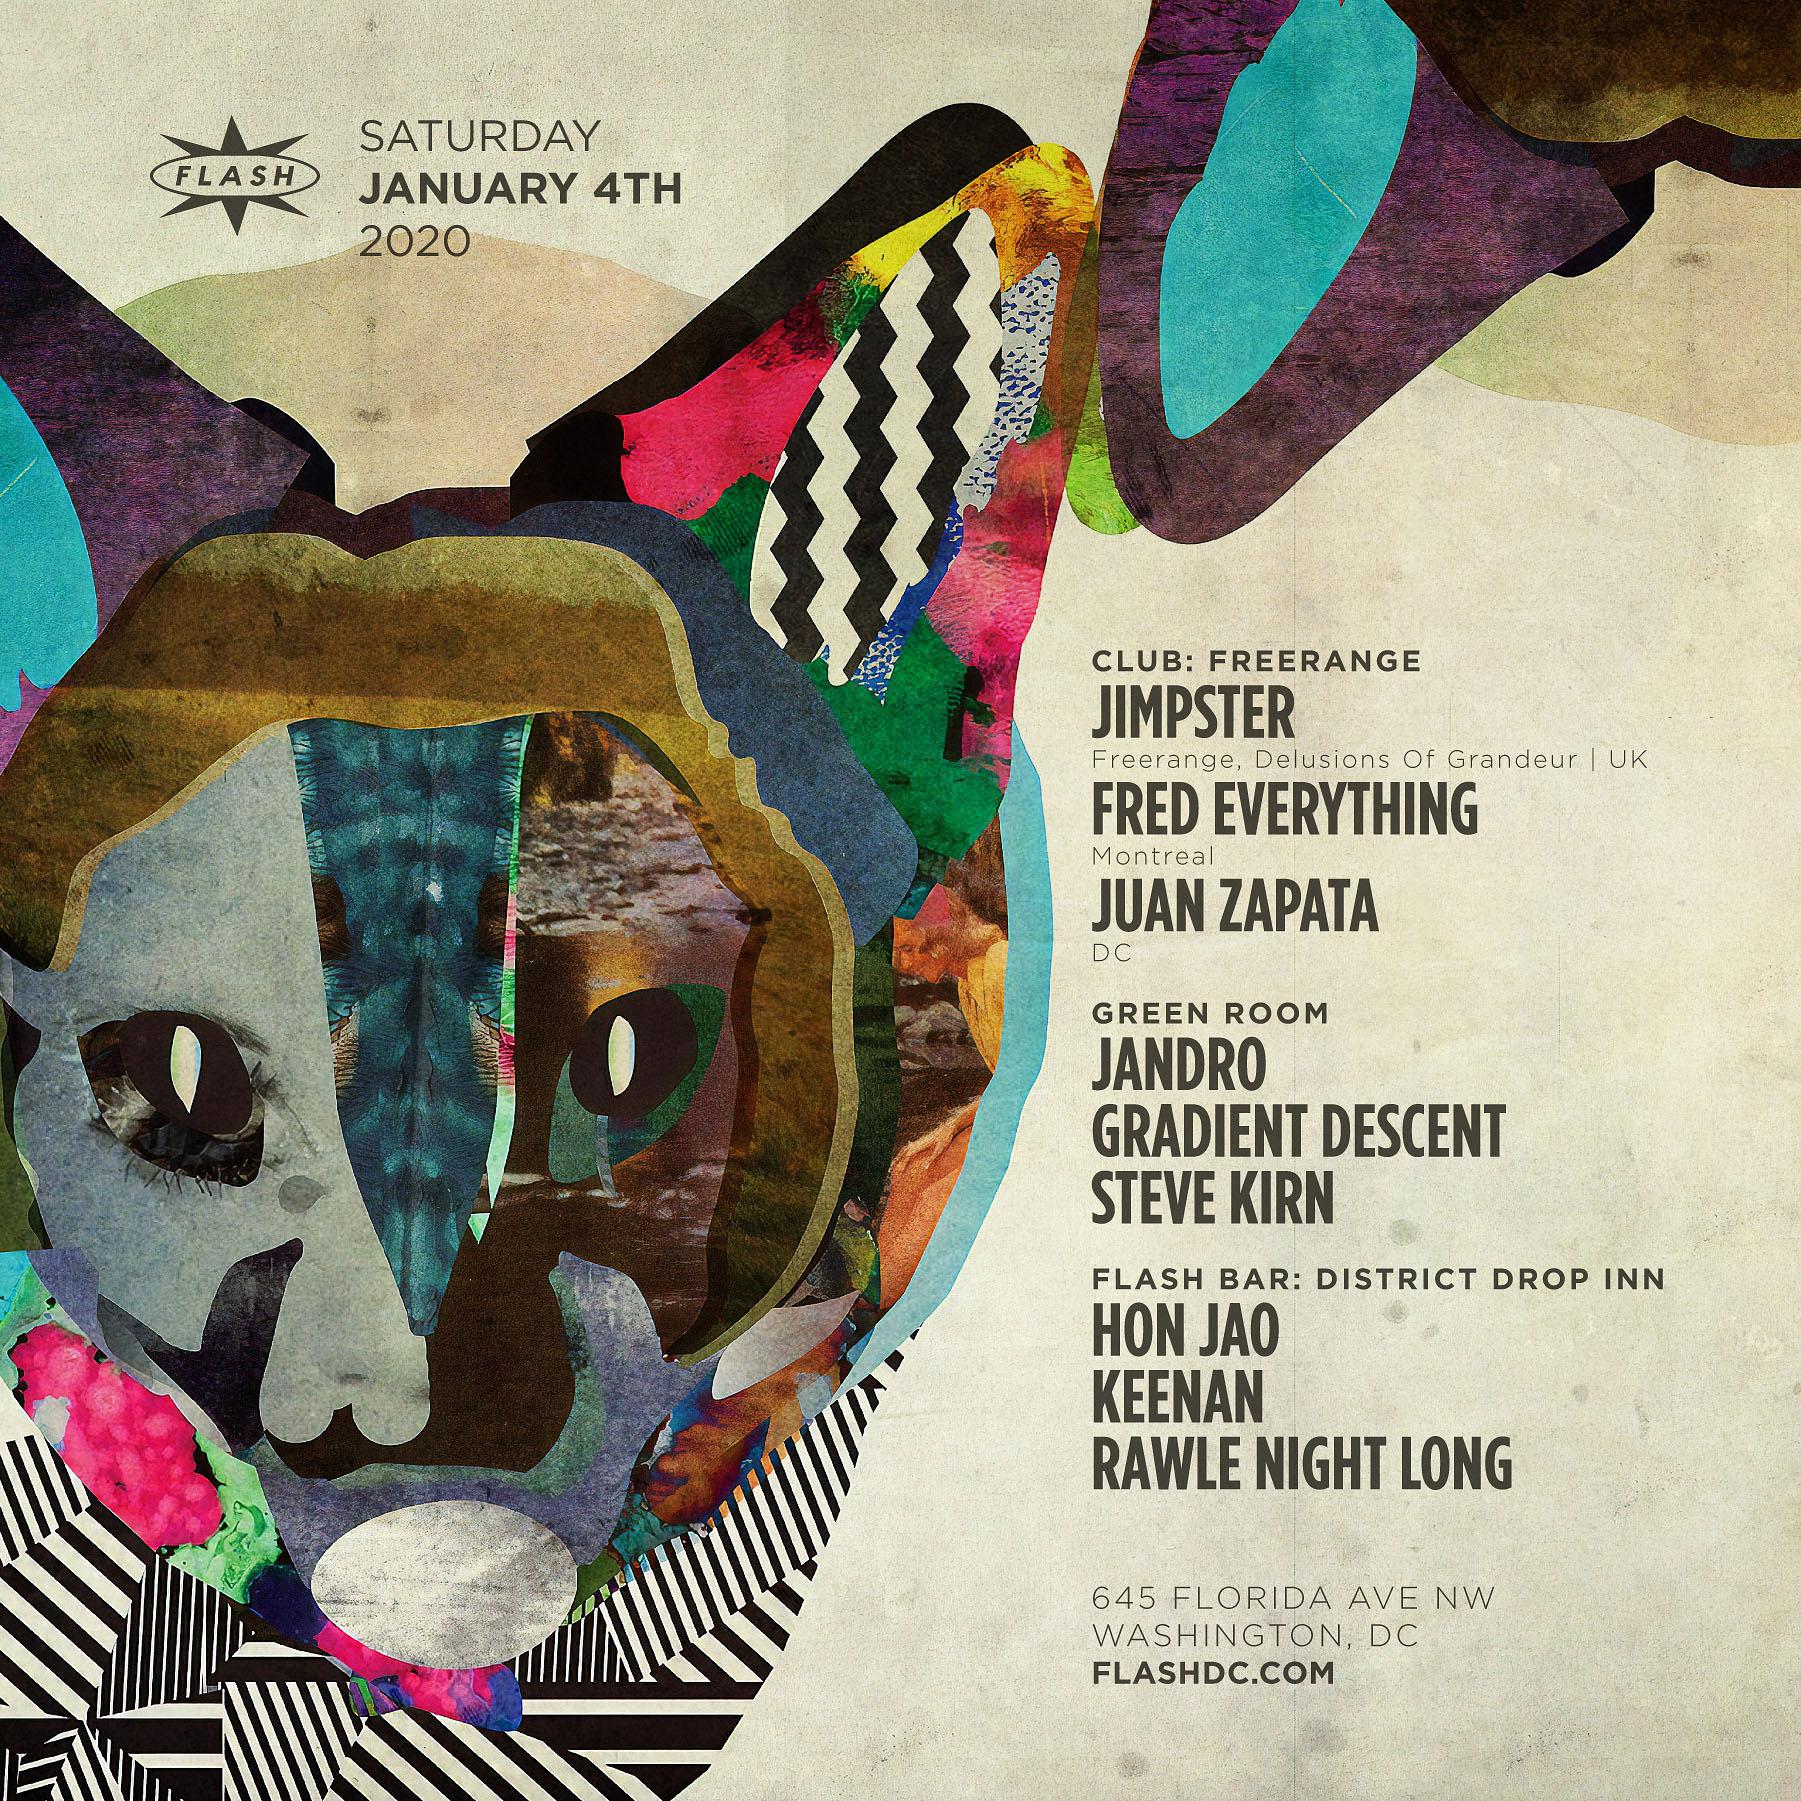 Freerange: Jimpster - Fred Everything - Juan Zapata event thumbnail